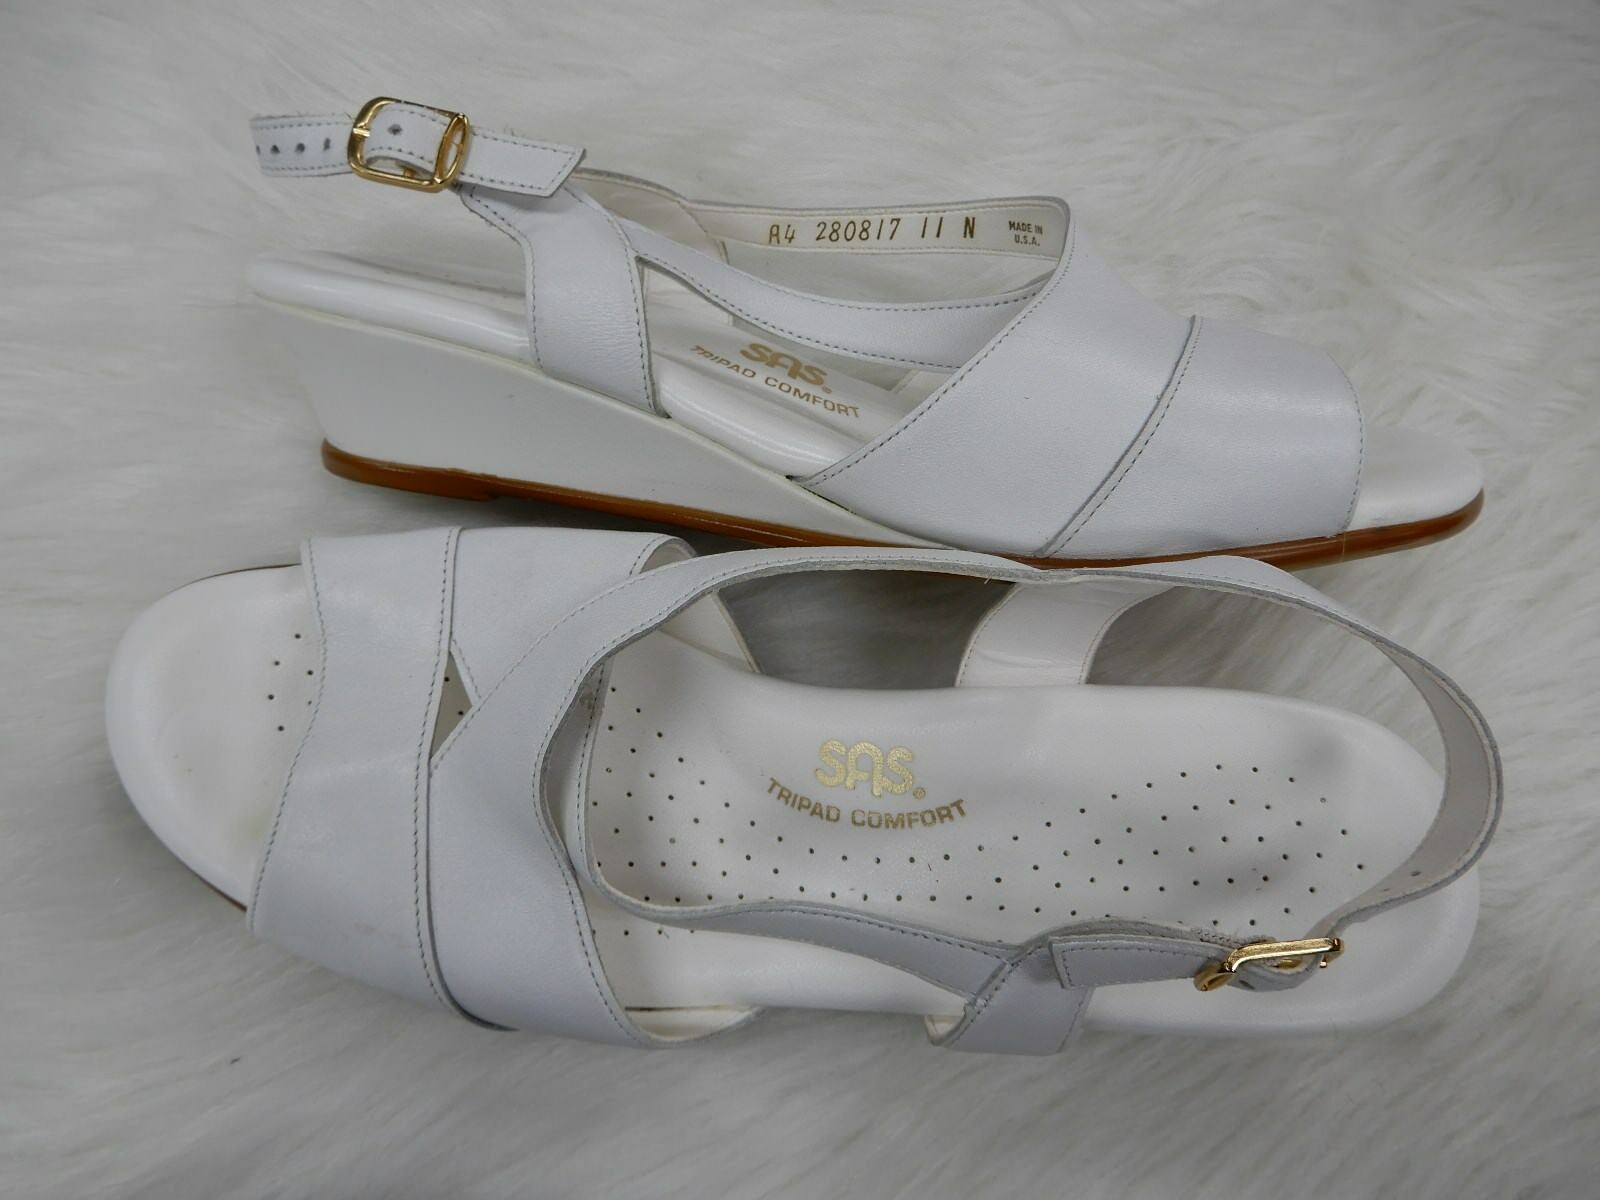 SAS White leather wedge sandals Narrow size 11 N 11 Narrow sandals  L@@K! 557f18